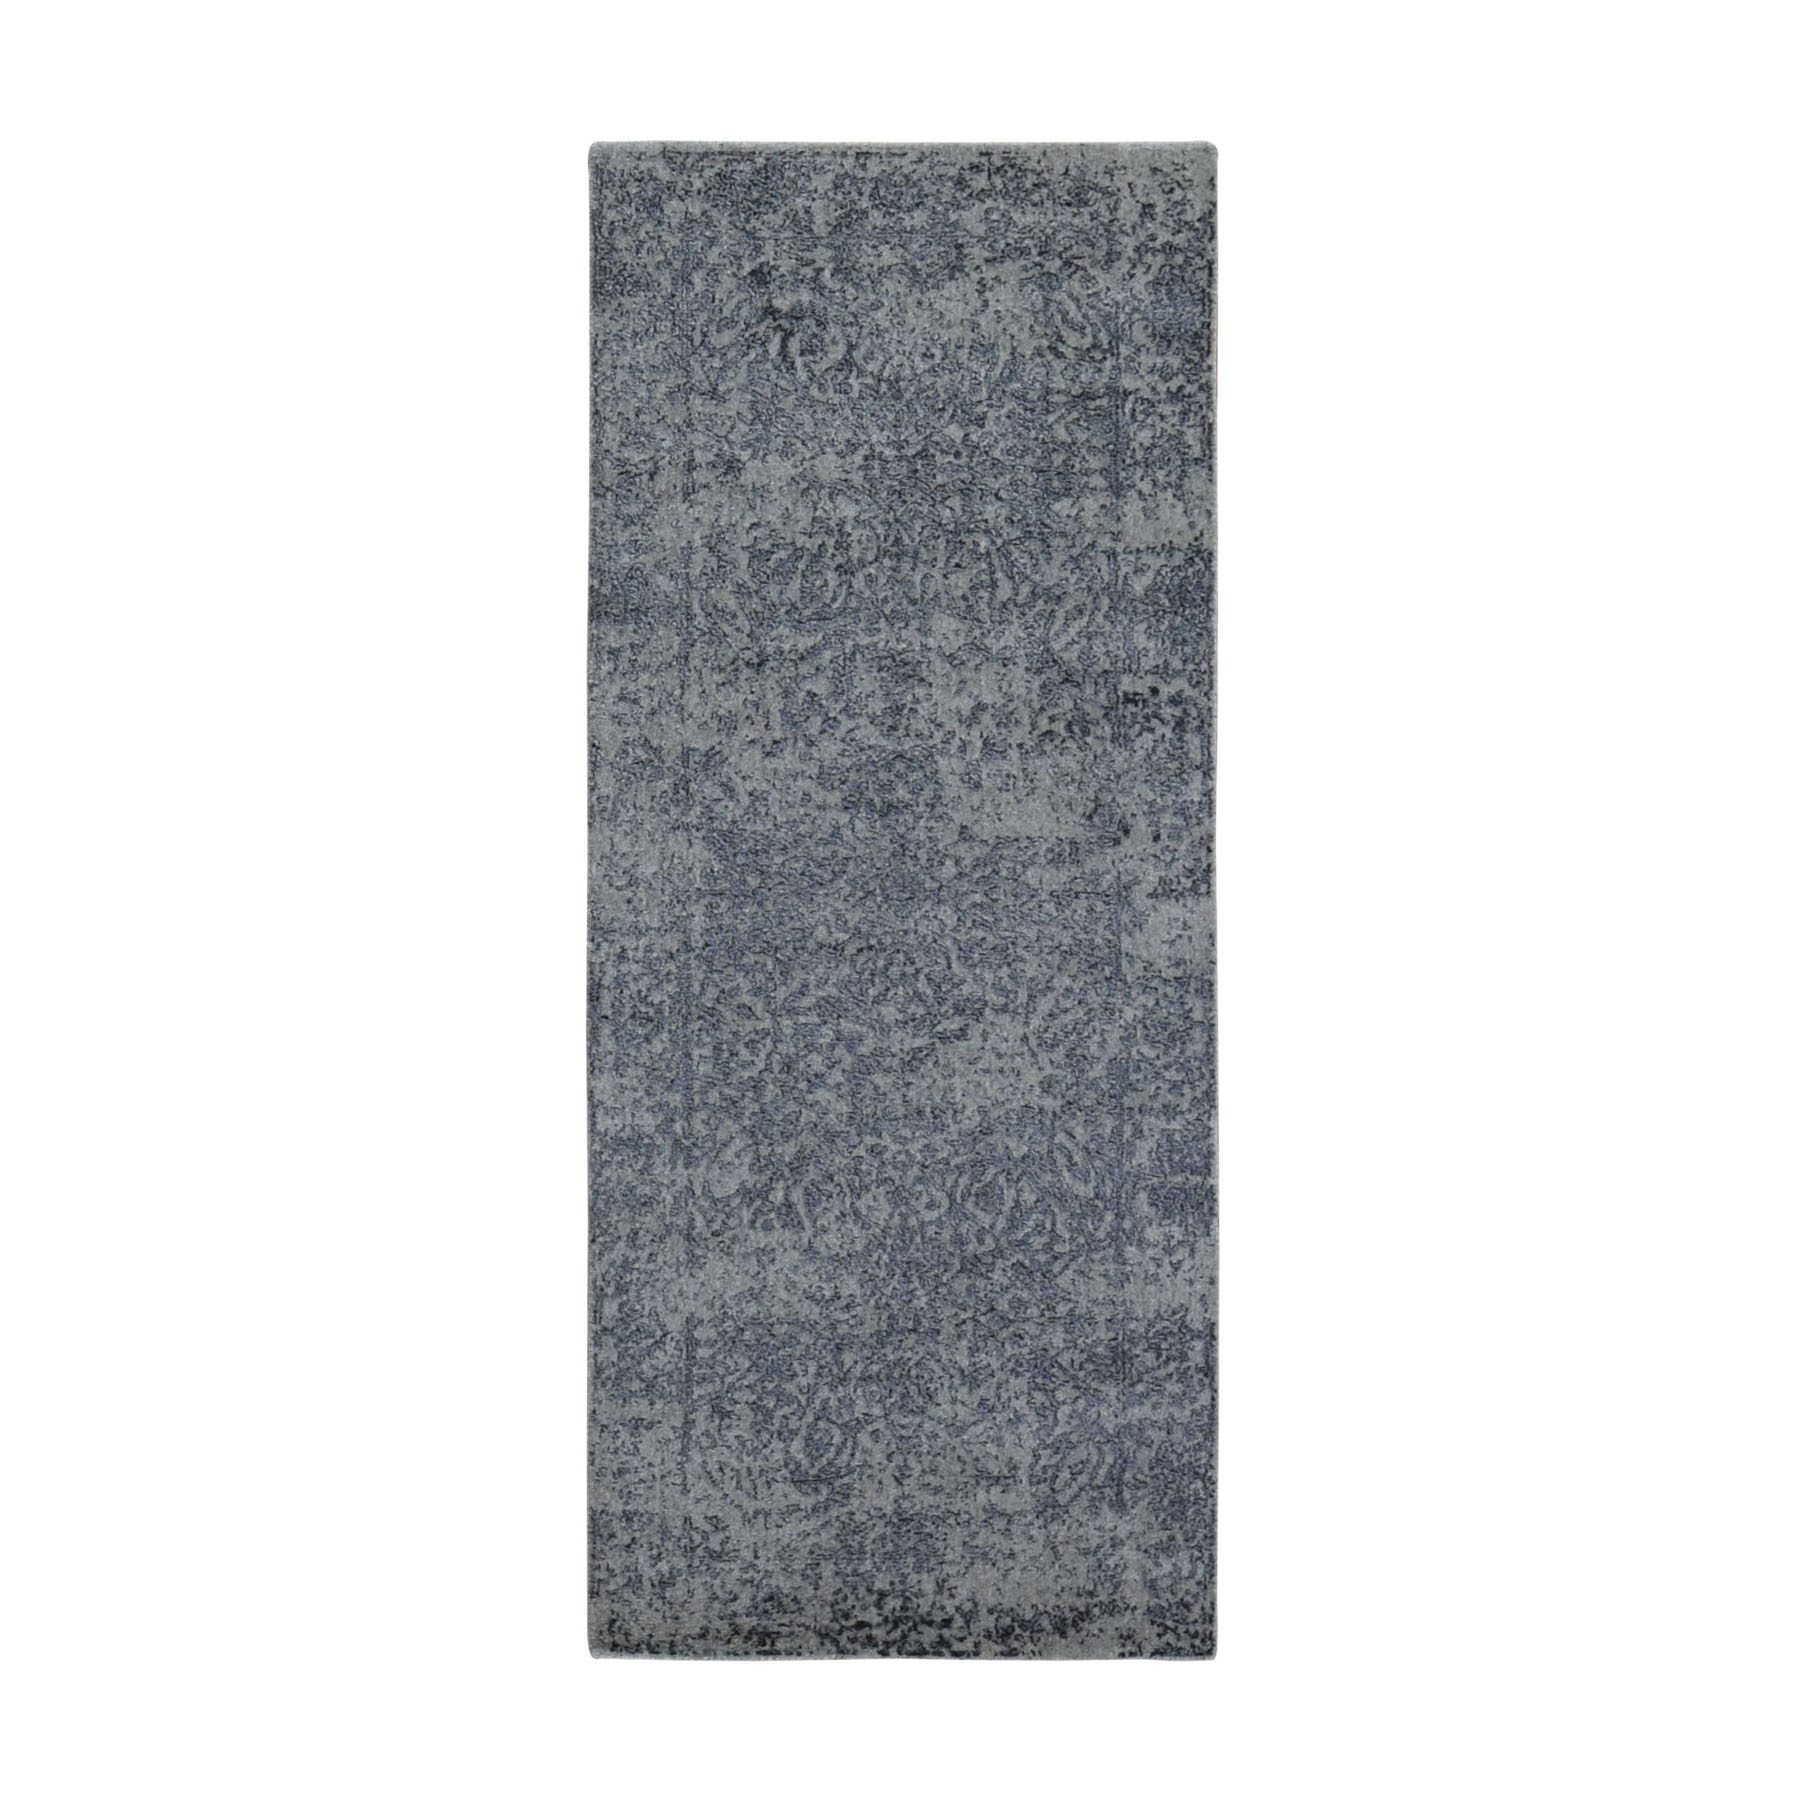 Transitional Hand Loomed Grey Rug No: 0198940